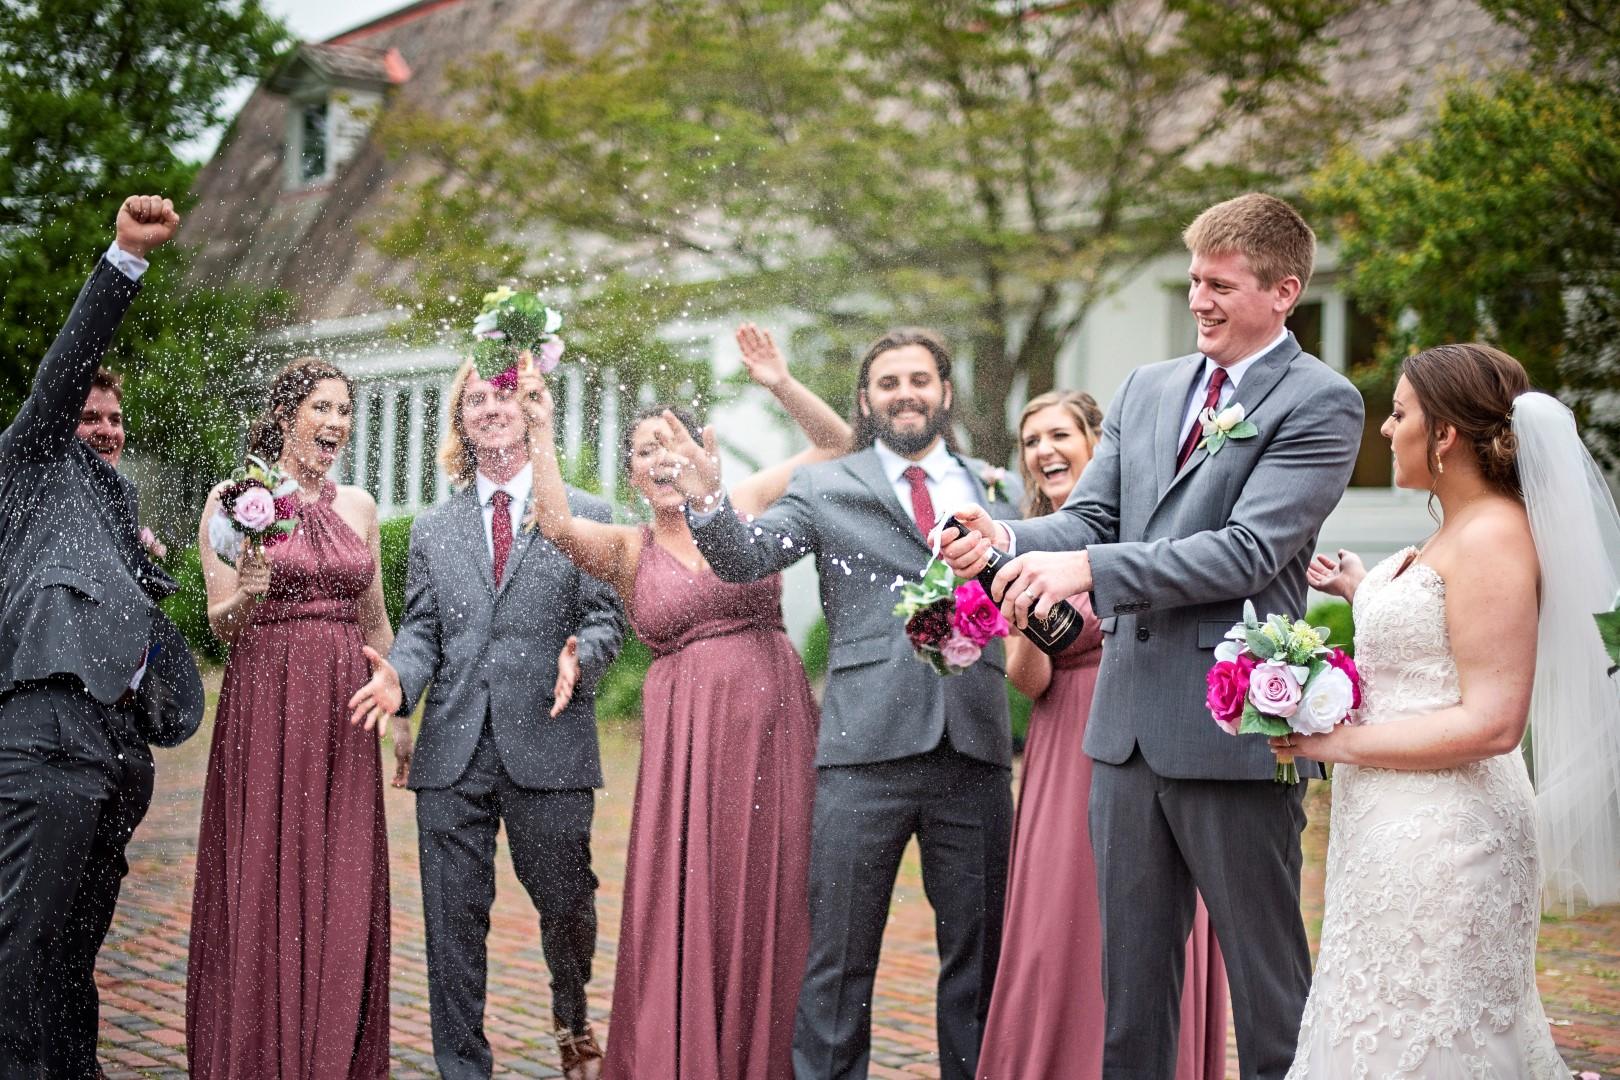 Courtney & Matt Dairy Barn Wedding May 2019_22 (Large).jpg